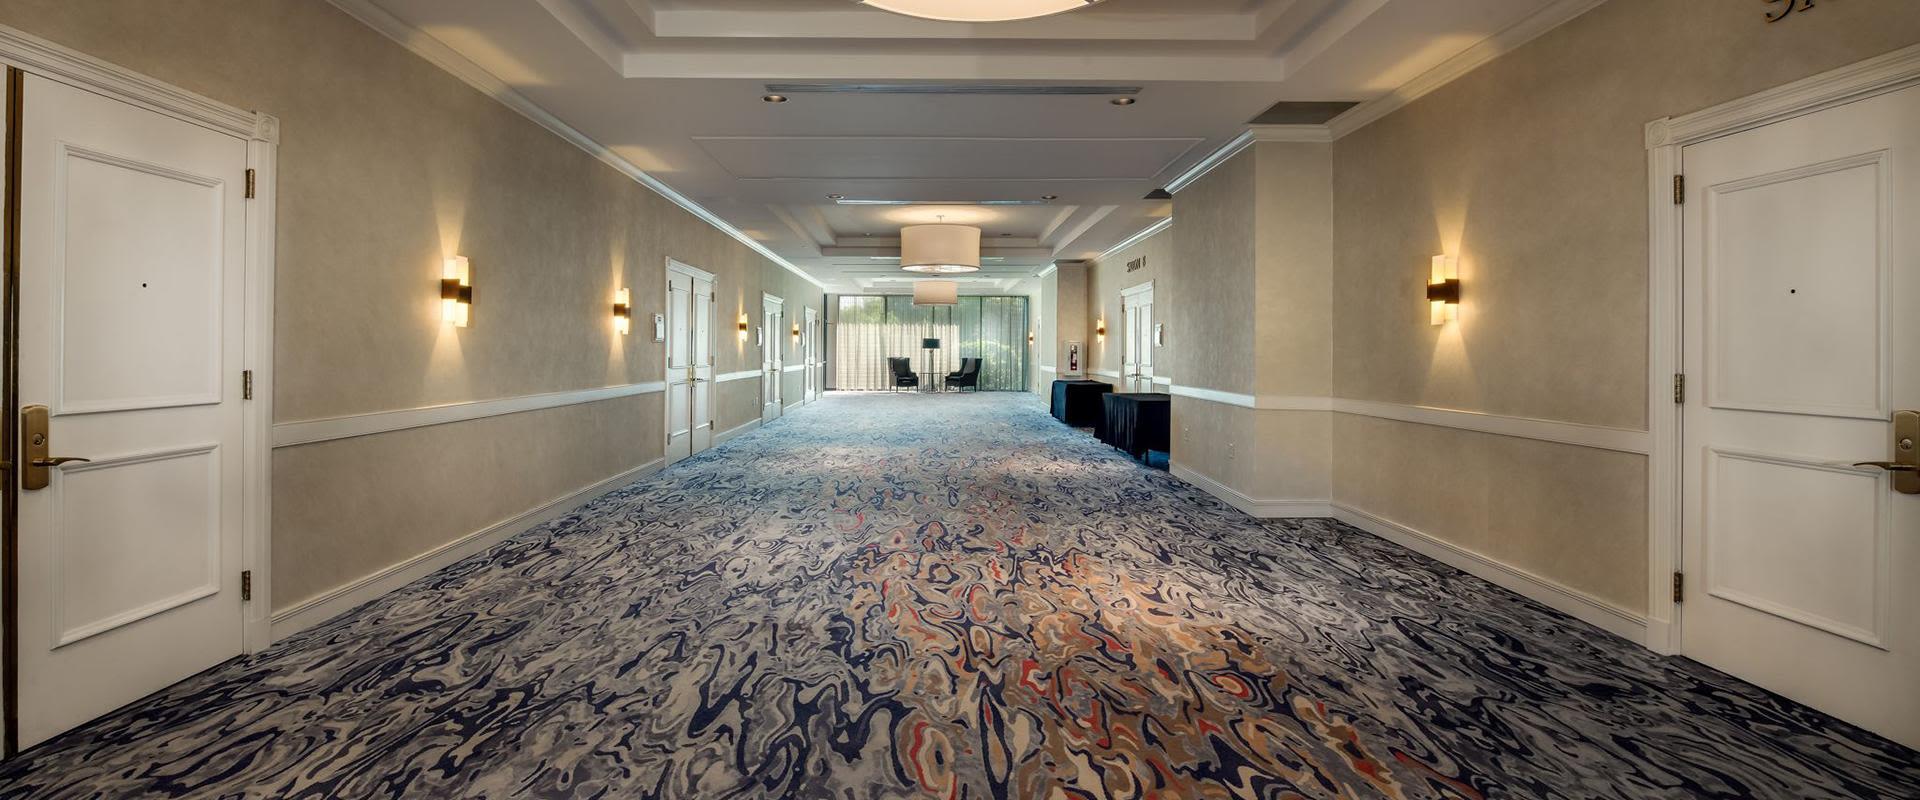 Charlotte Hotel Empty Hallway Gathering Space